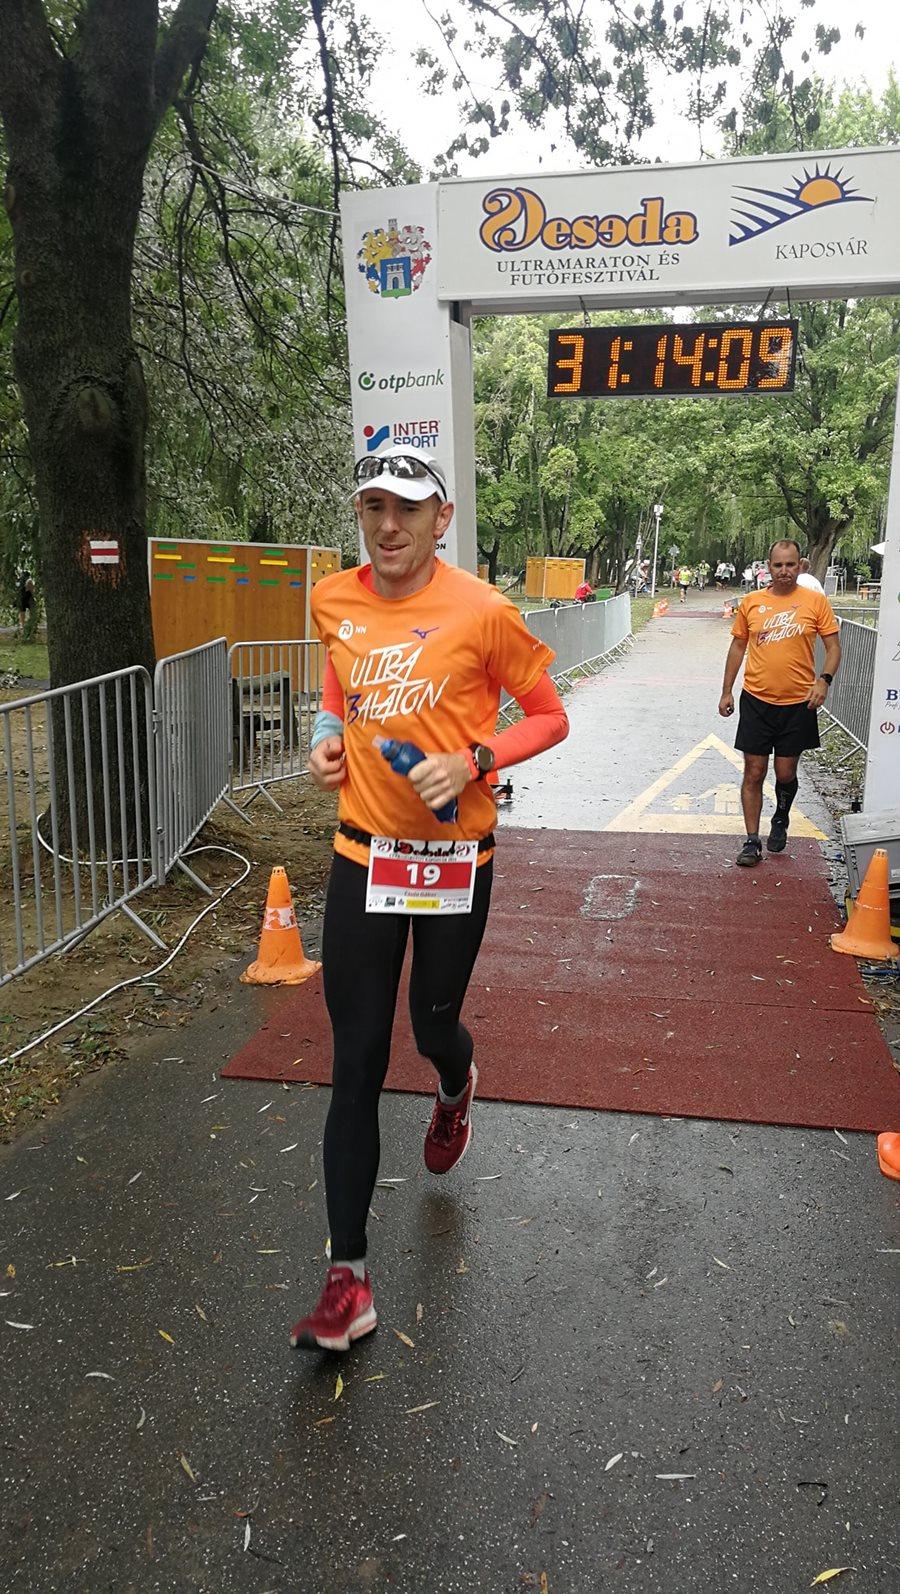 Duma-Deseda ultramaraton 2019